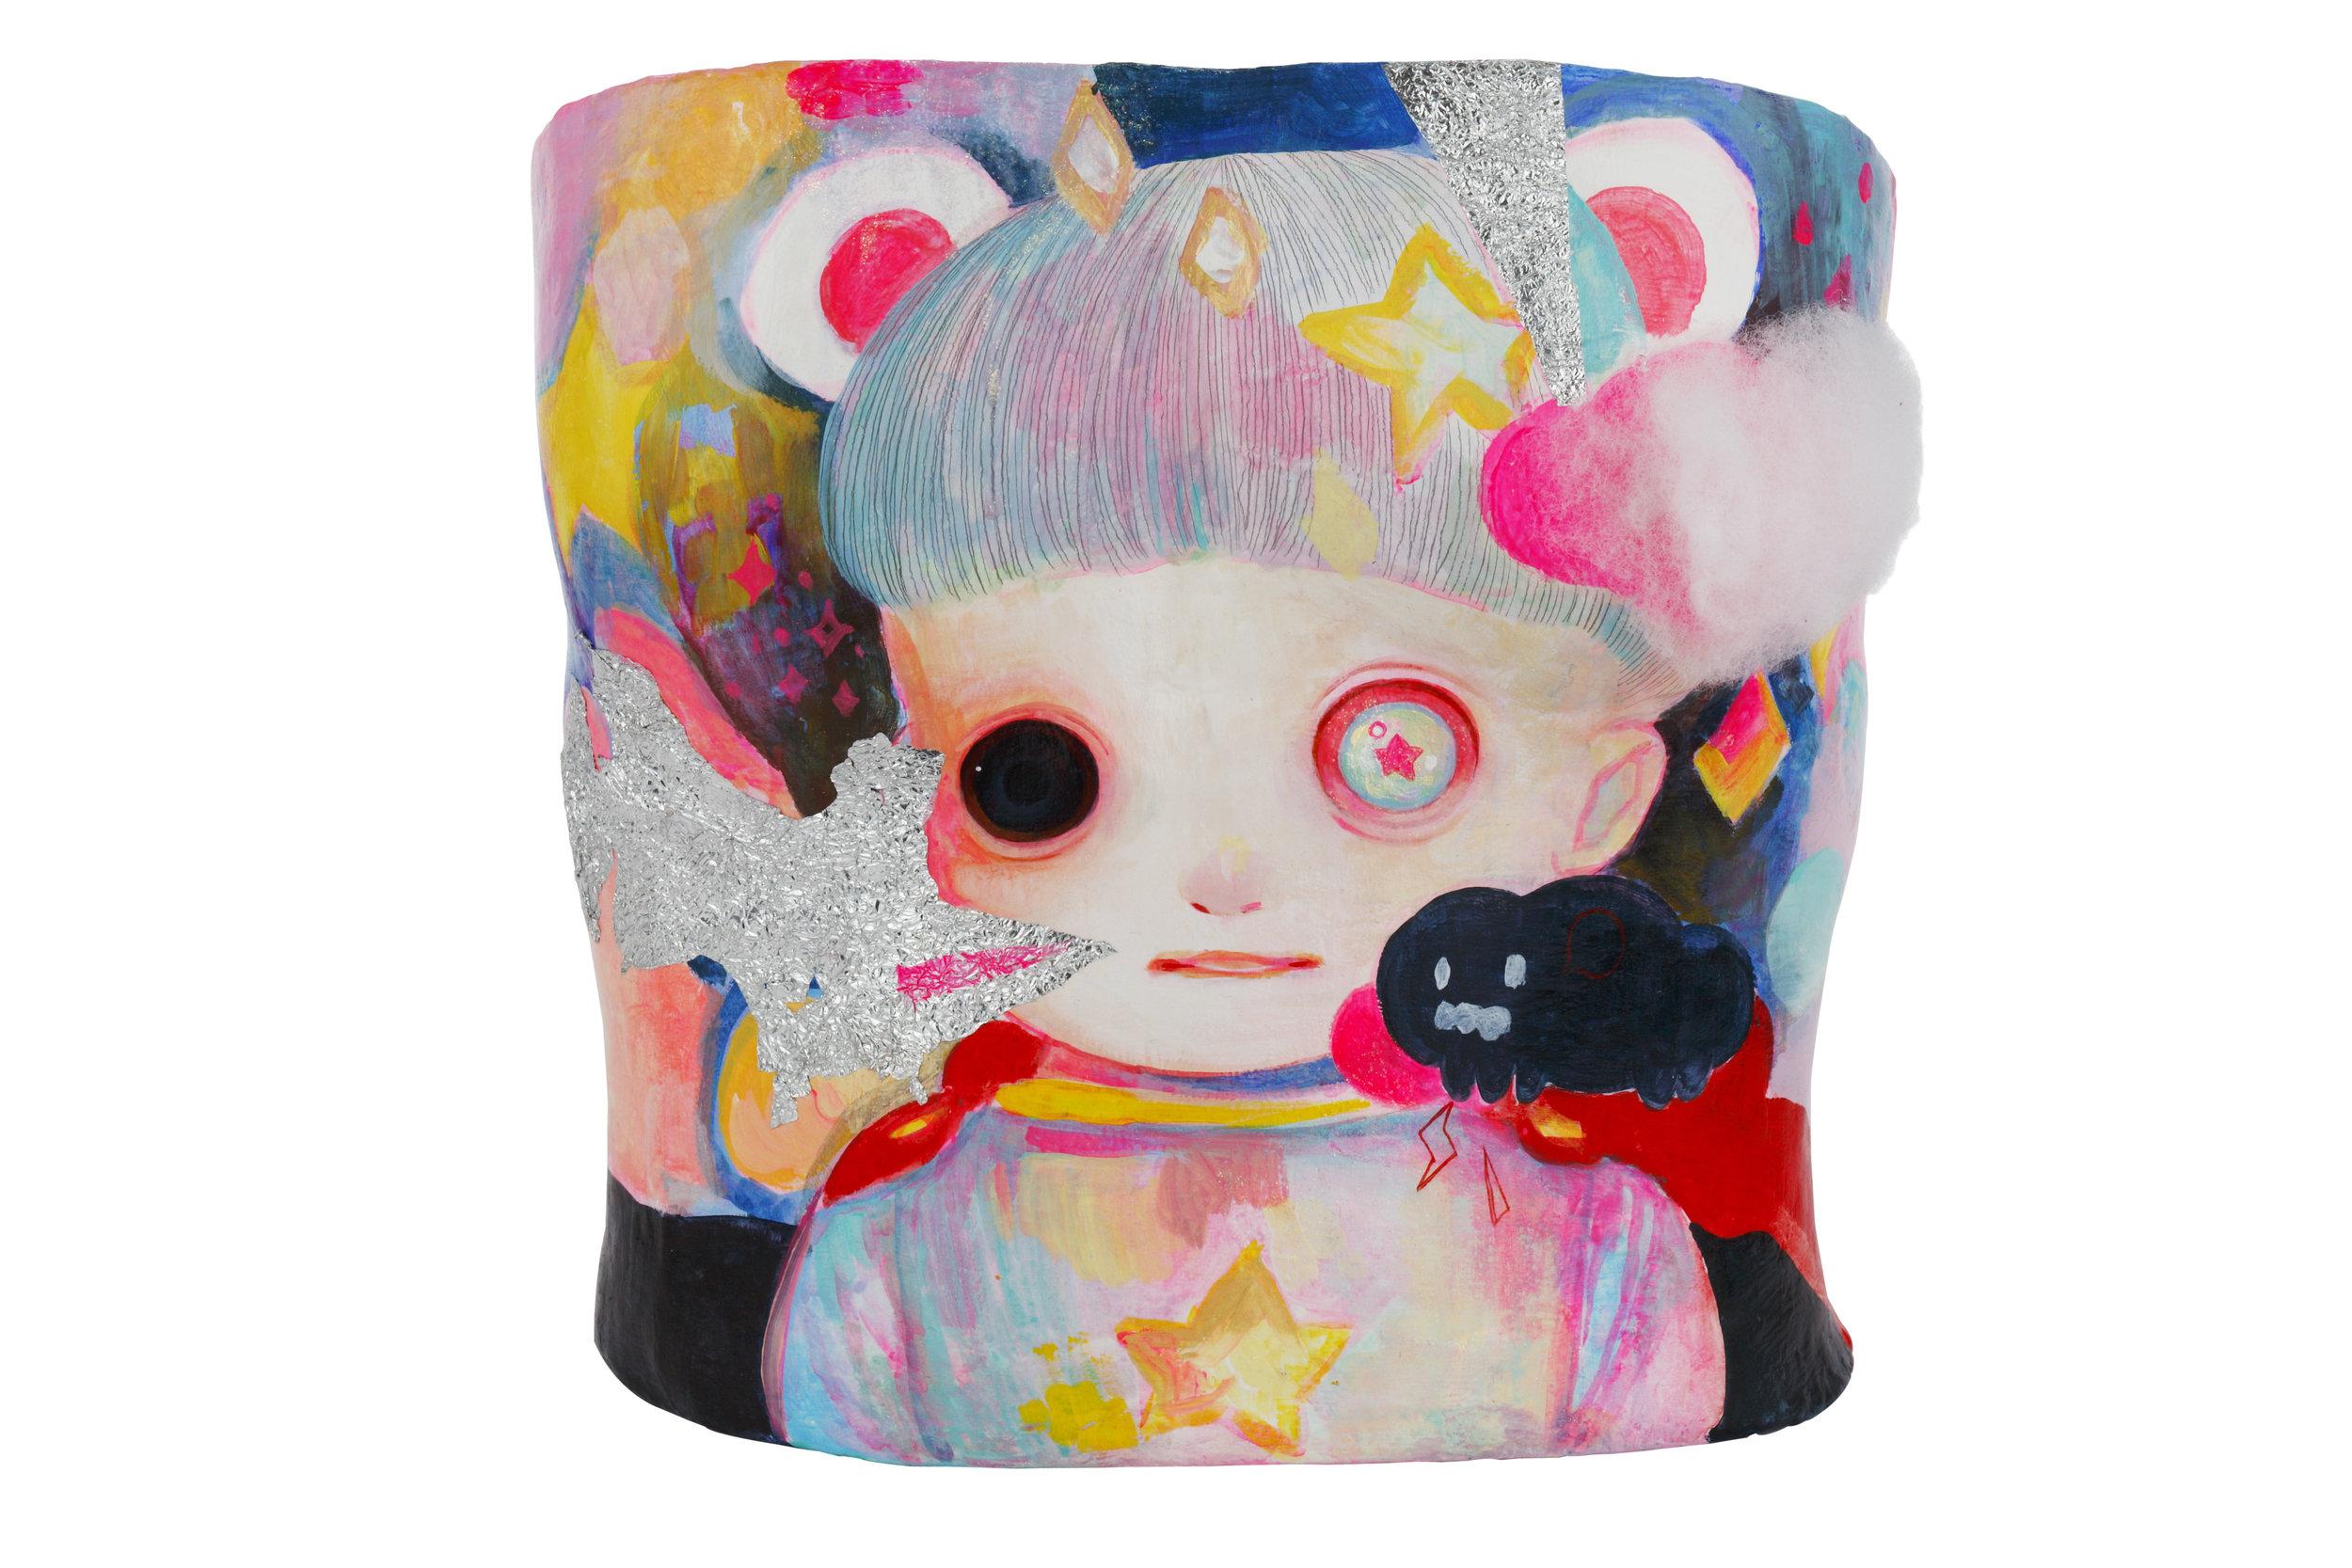 ARTIST: HIKARI SHIMODA | CASTEE: AKI KANEKO